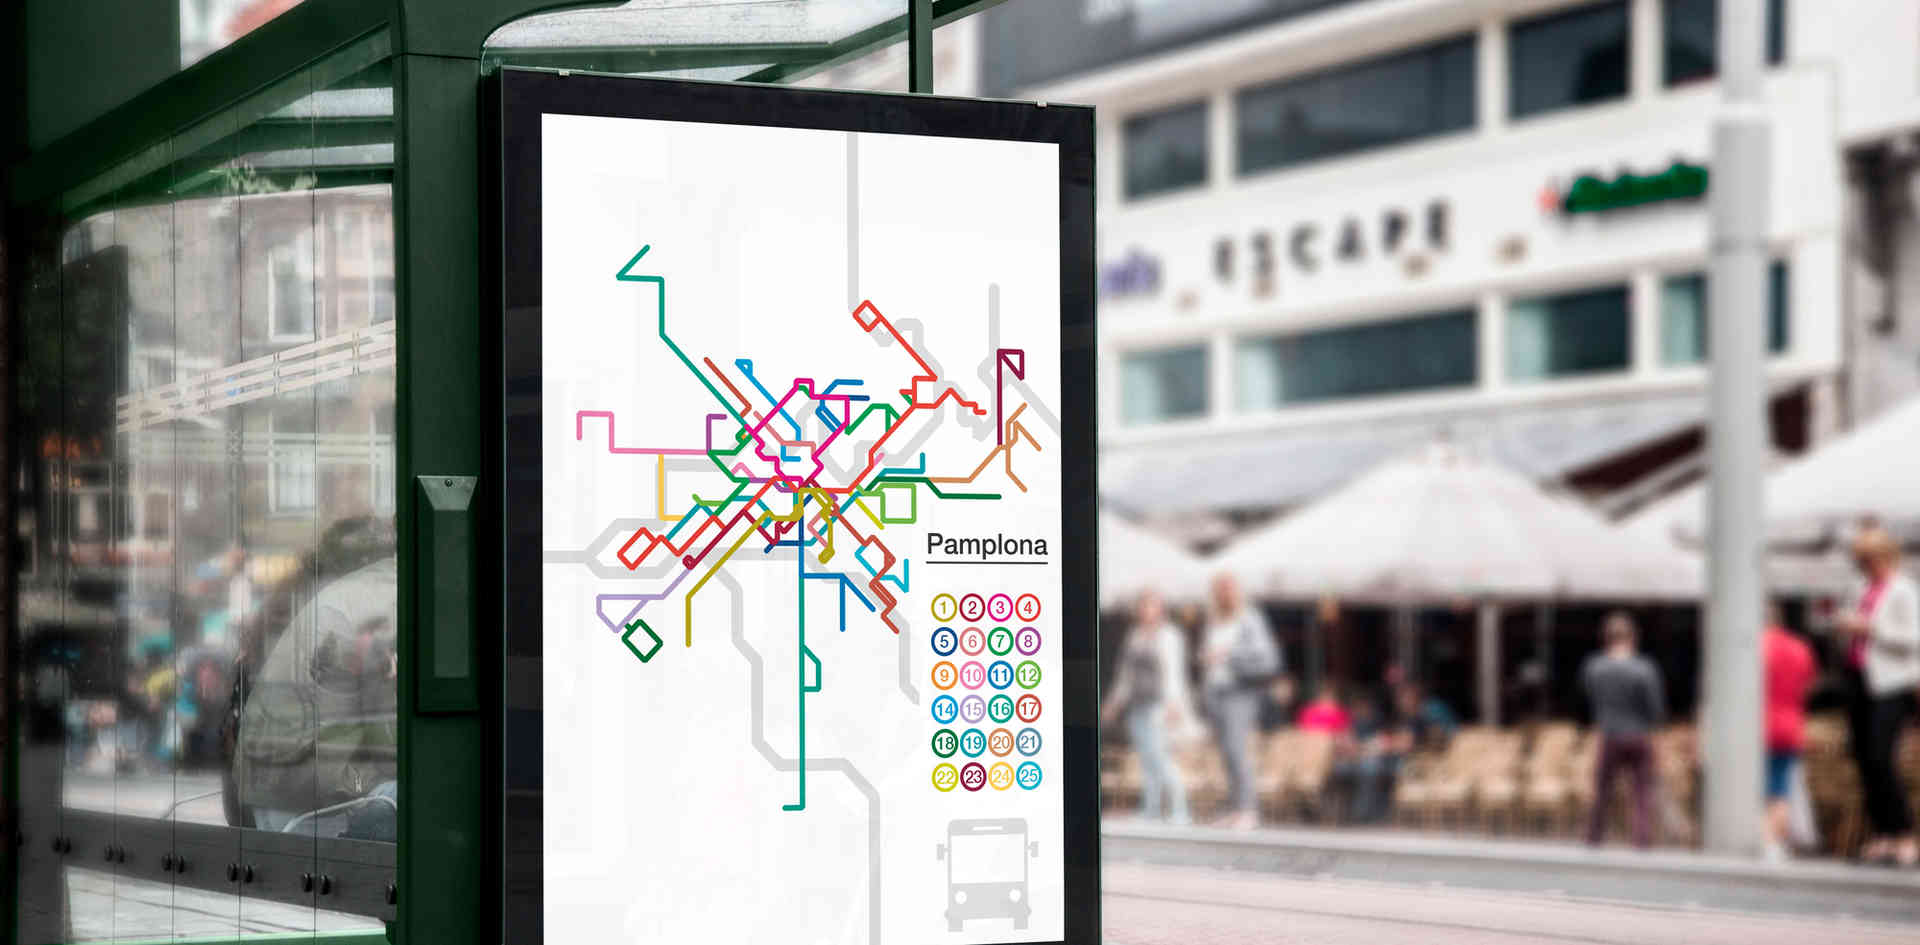 Mapa de lineas de autobus